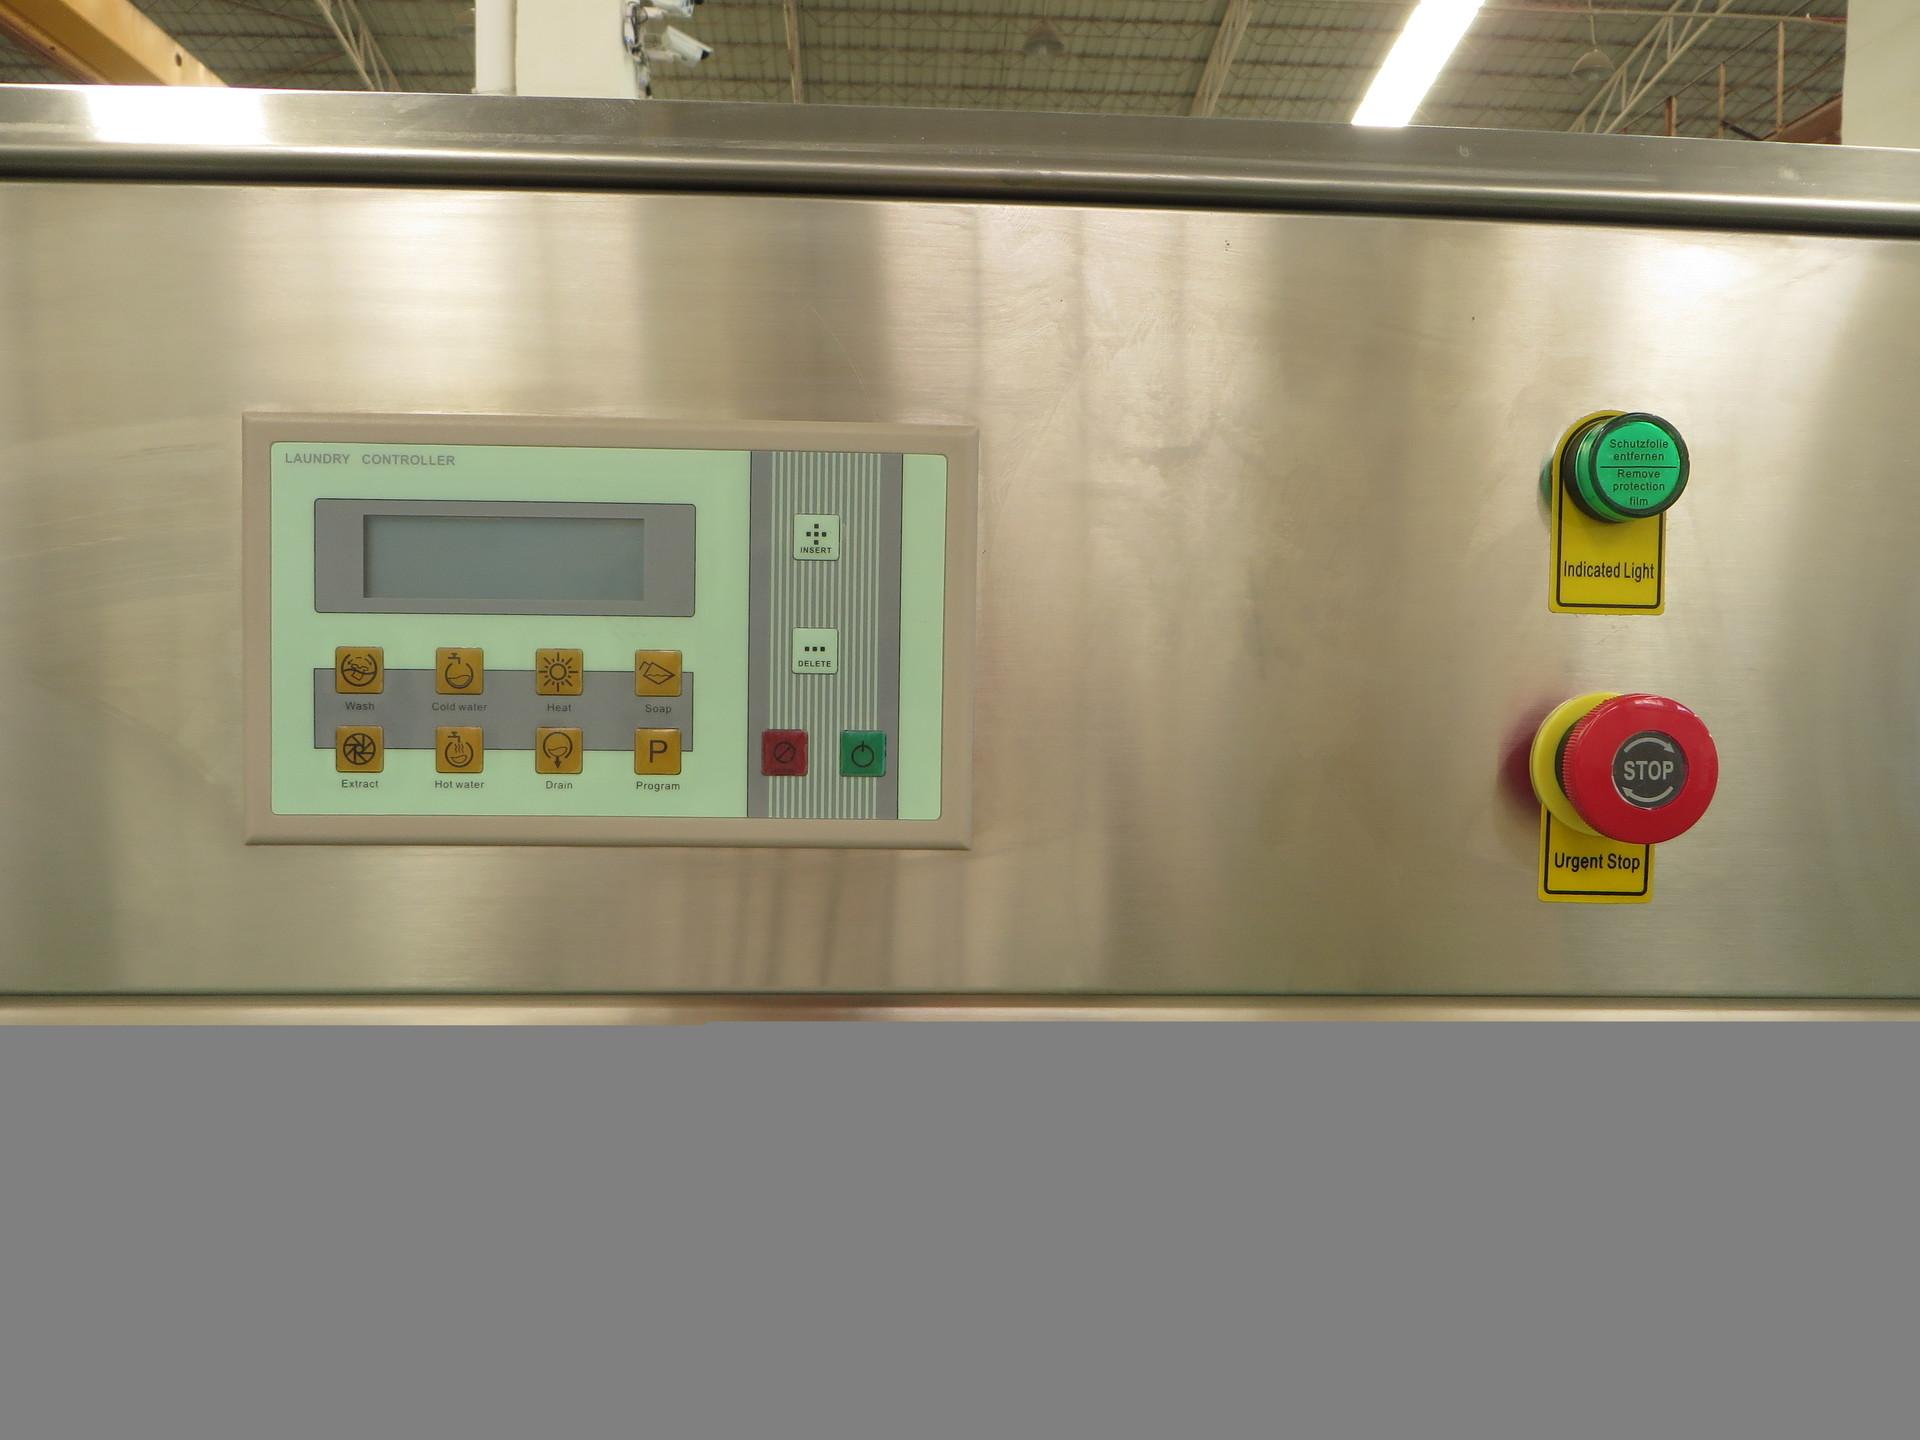 automatic washing machine(washer,dryer,flatwork ironer)